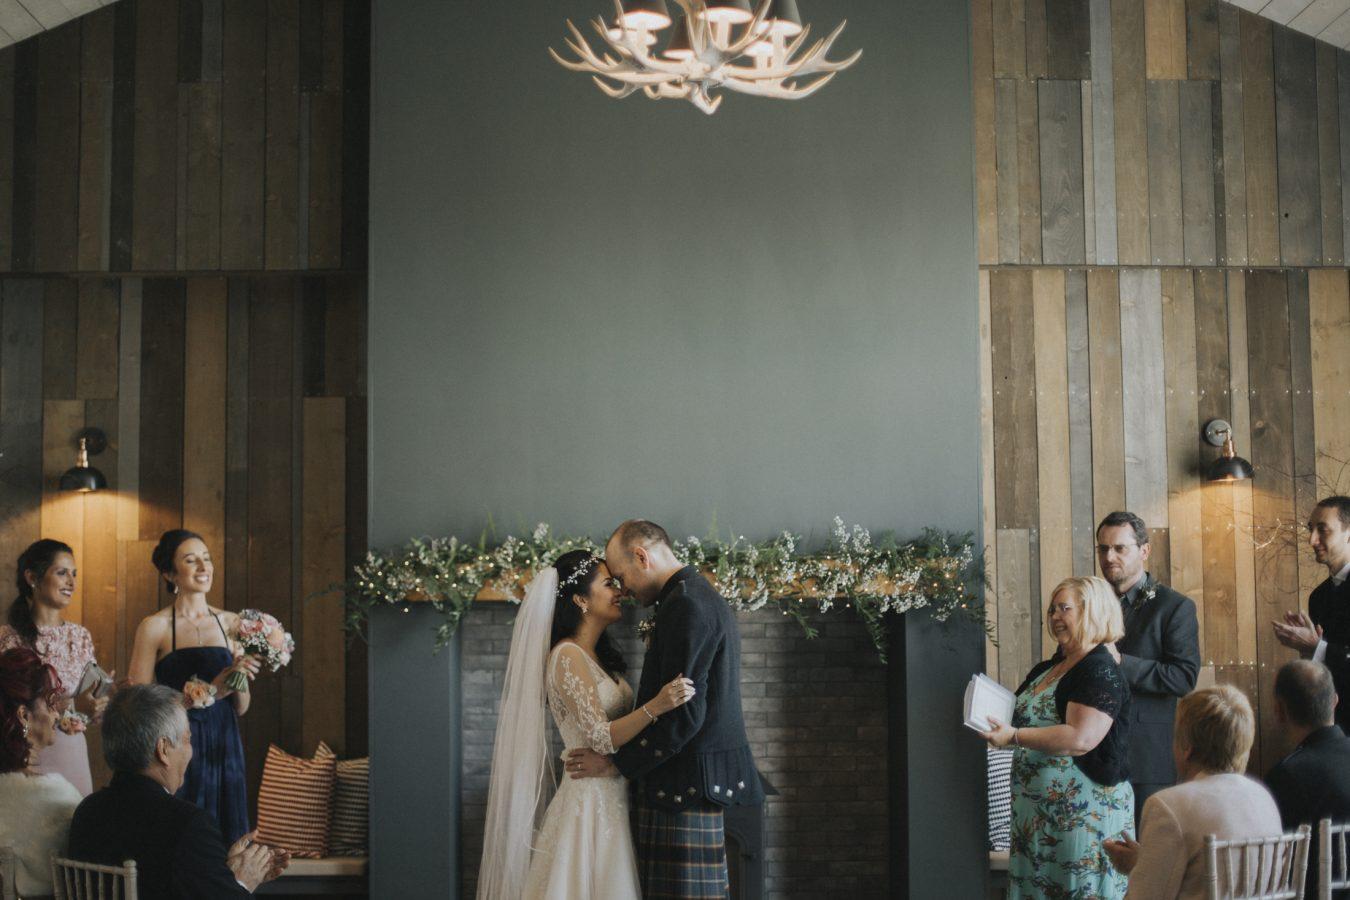 Barn at Barra Castle Wedding | Scottish Rustic Wedding Venue | Aberdeenshire Wedding Photographer | Fine Art Photography by Ceranna Photo